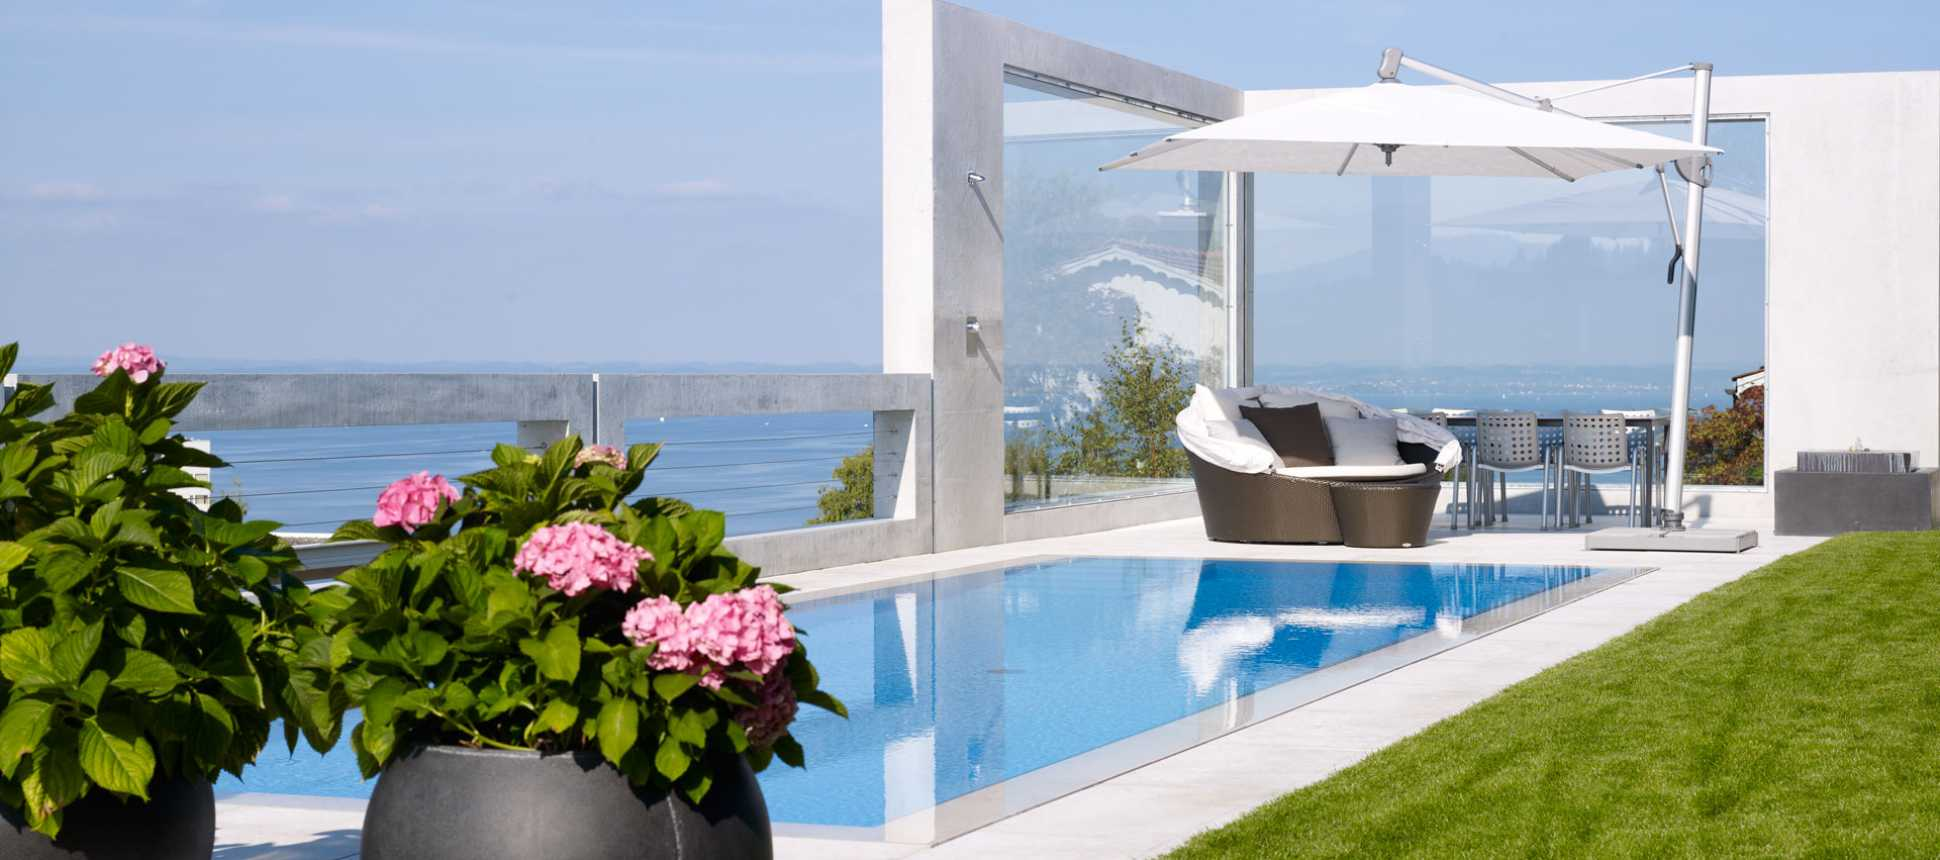 Gartenidee ac schwimmbadtechnik for Garten pool 8 eckig